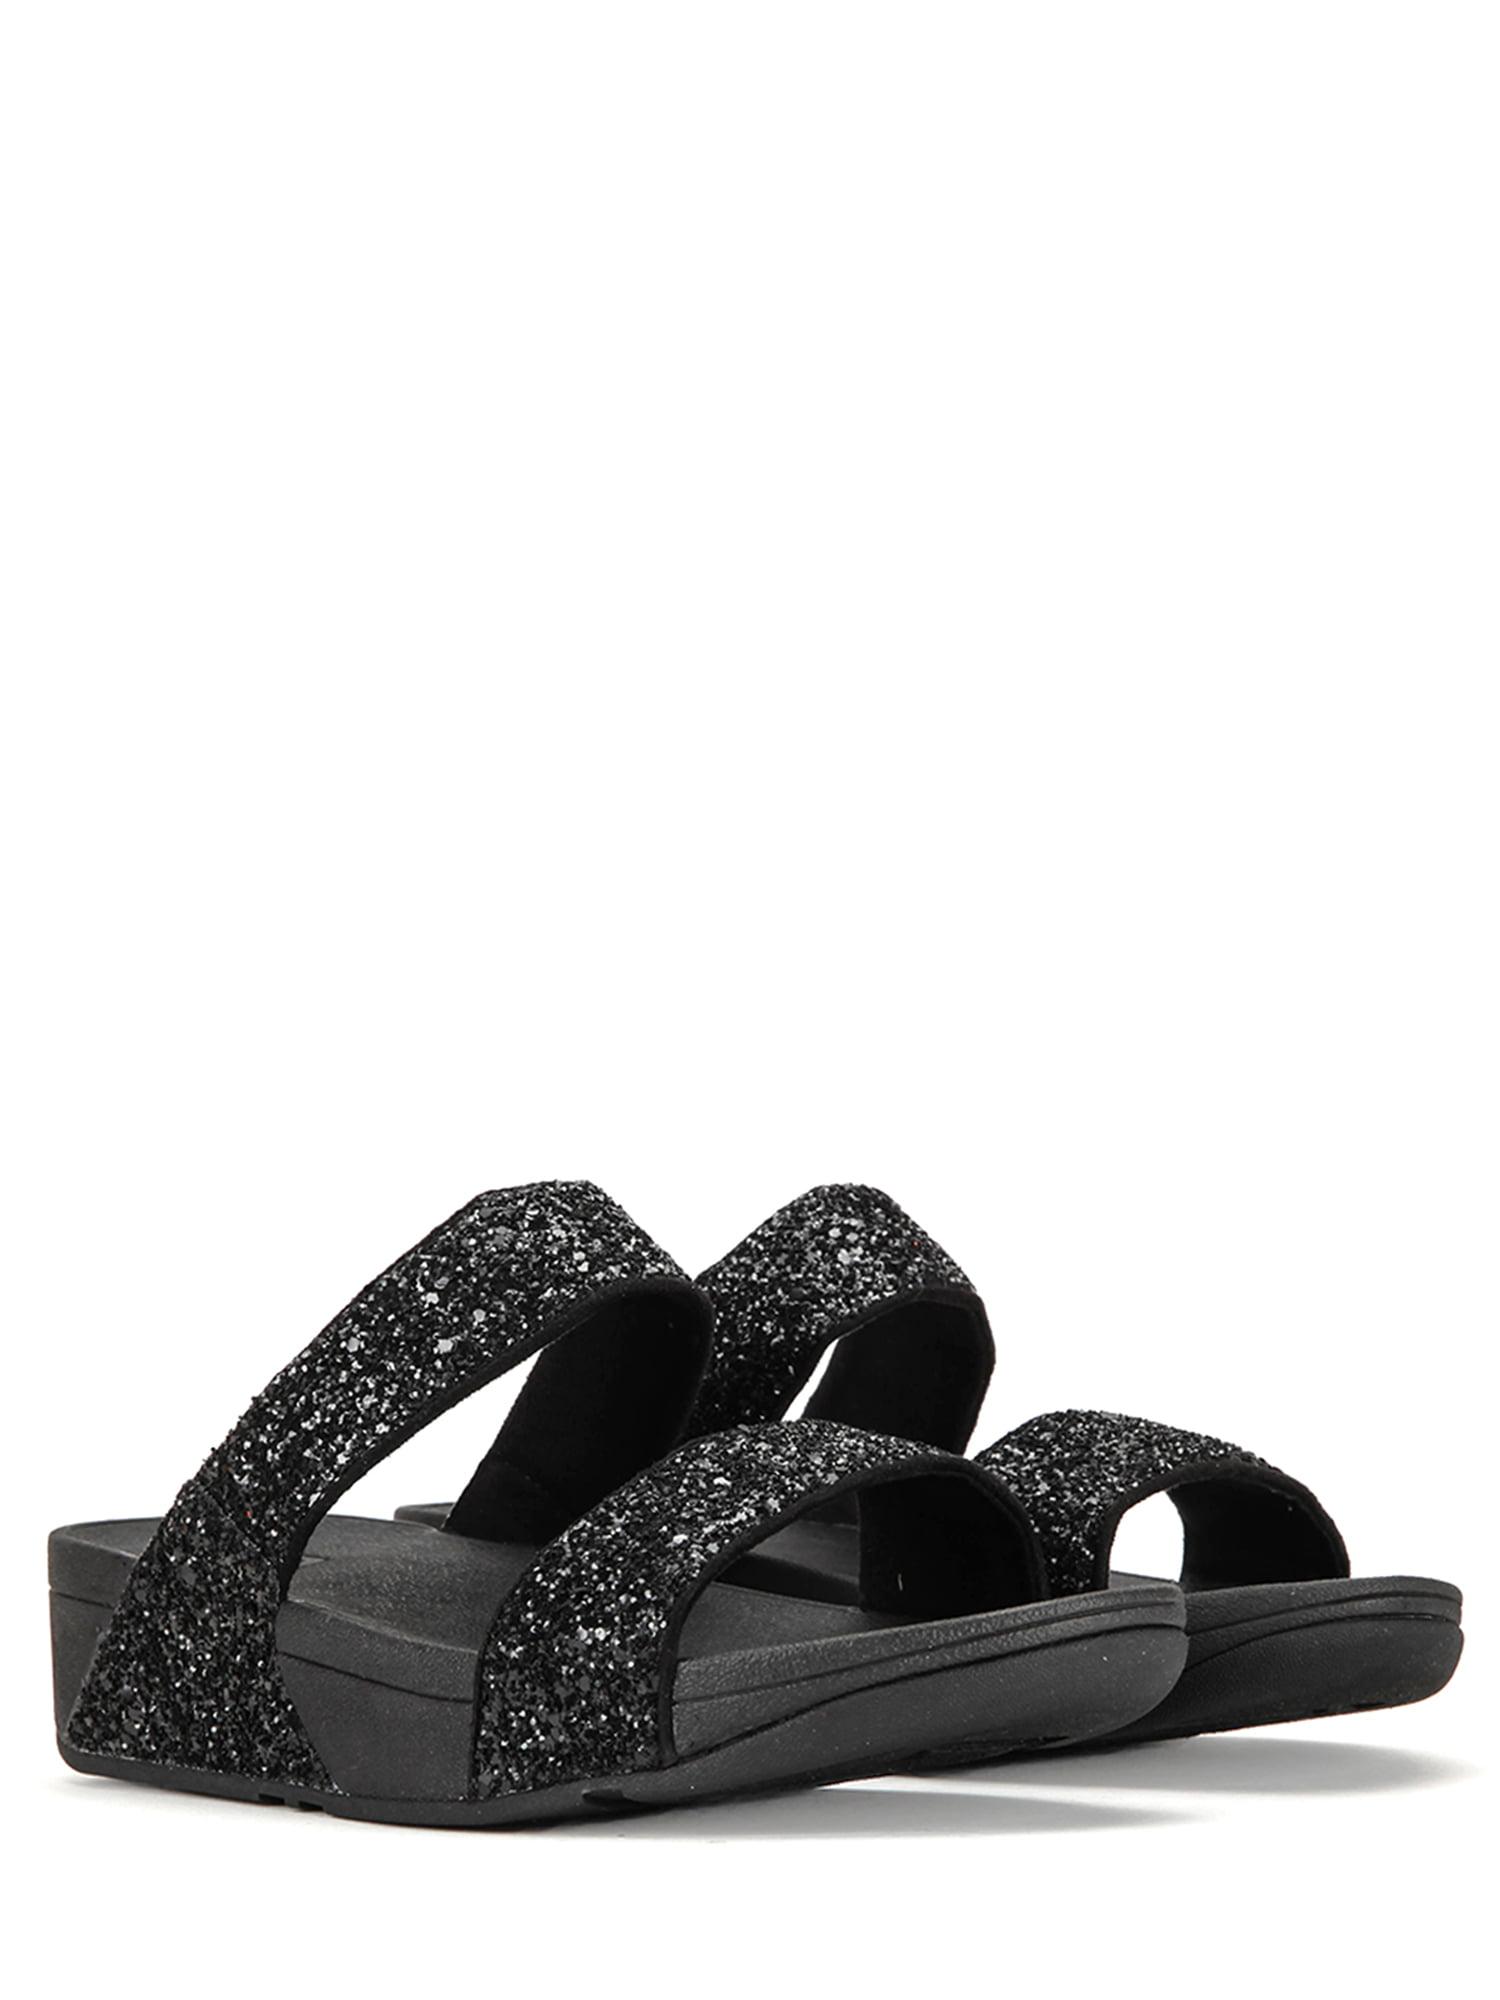 FitFlop Women's Glitterball Slide Sandals H24-001 Black